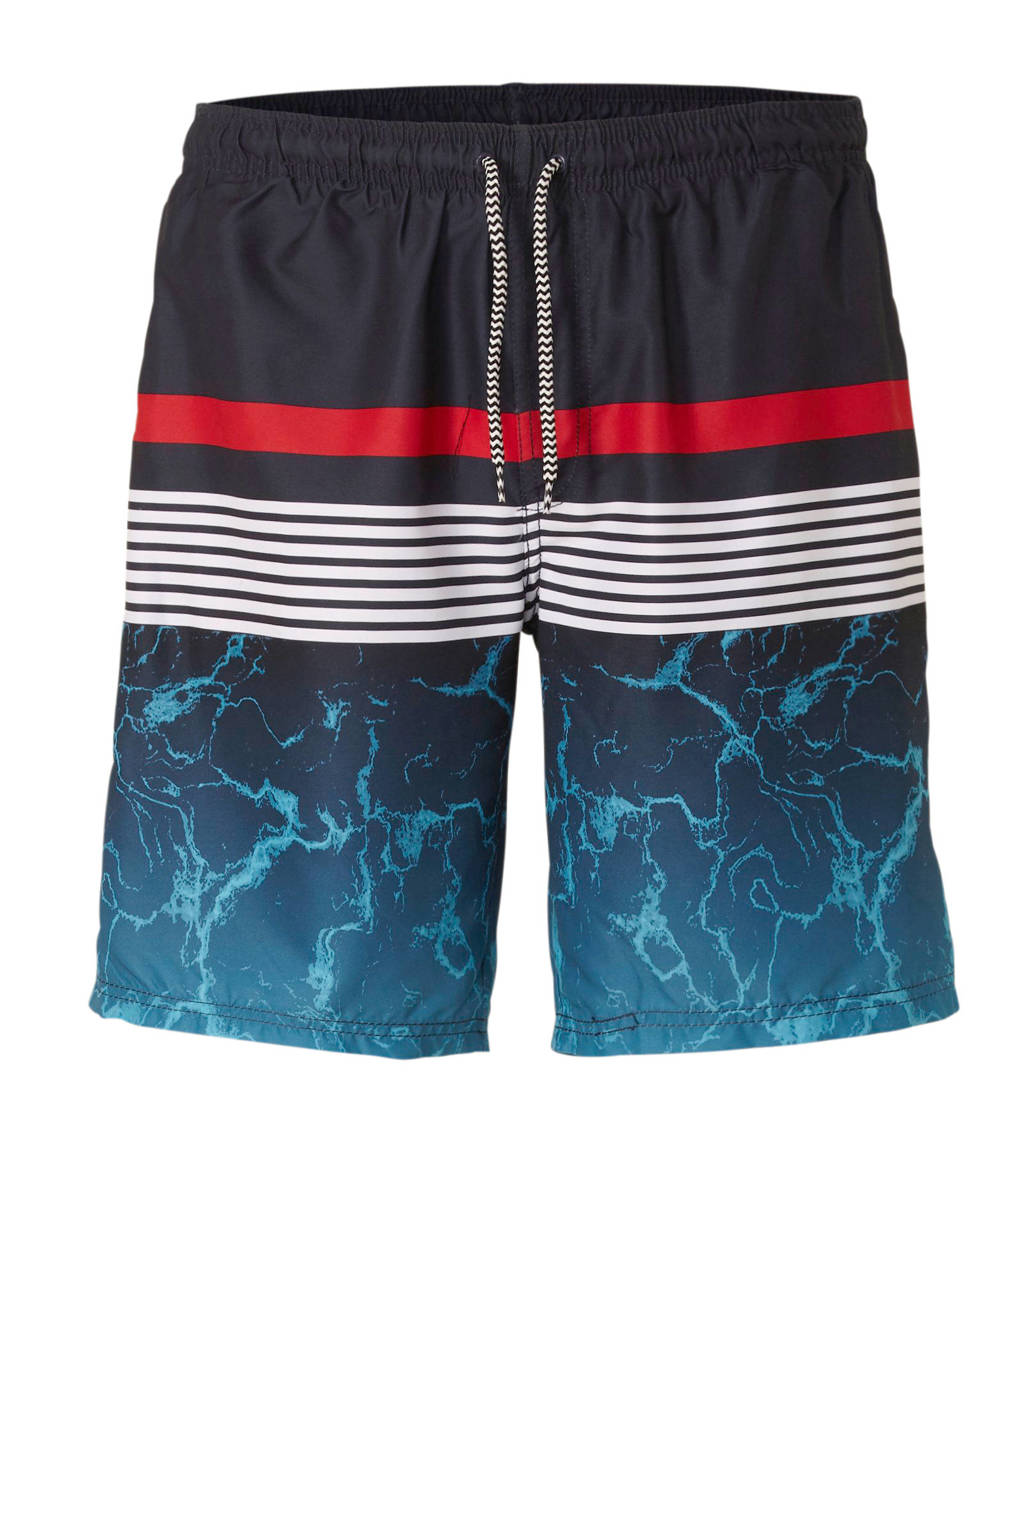 C&A zwemshort met printopdruk marine, Marine/rood/wit